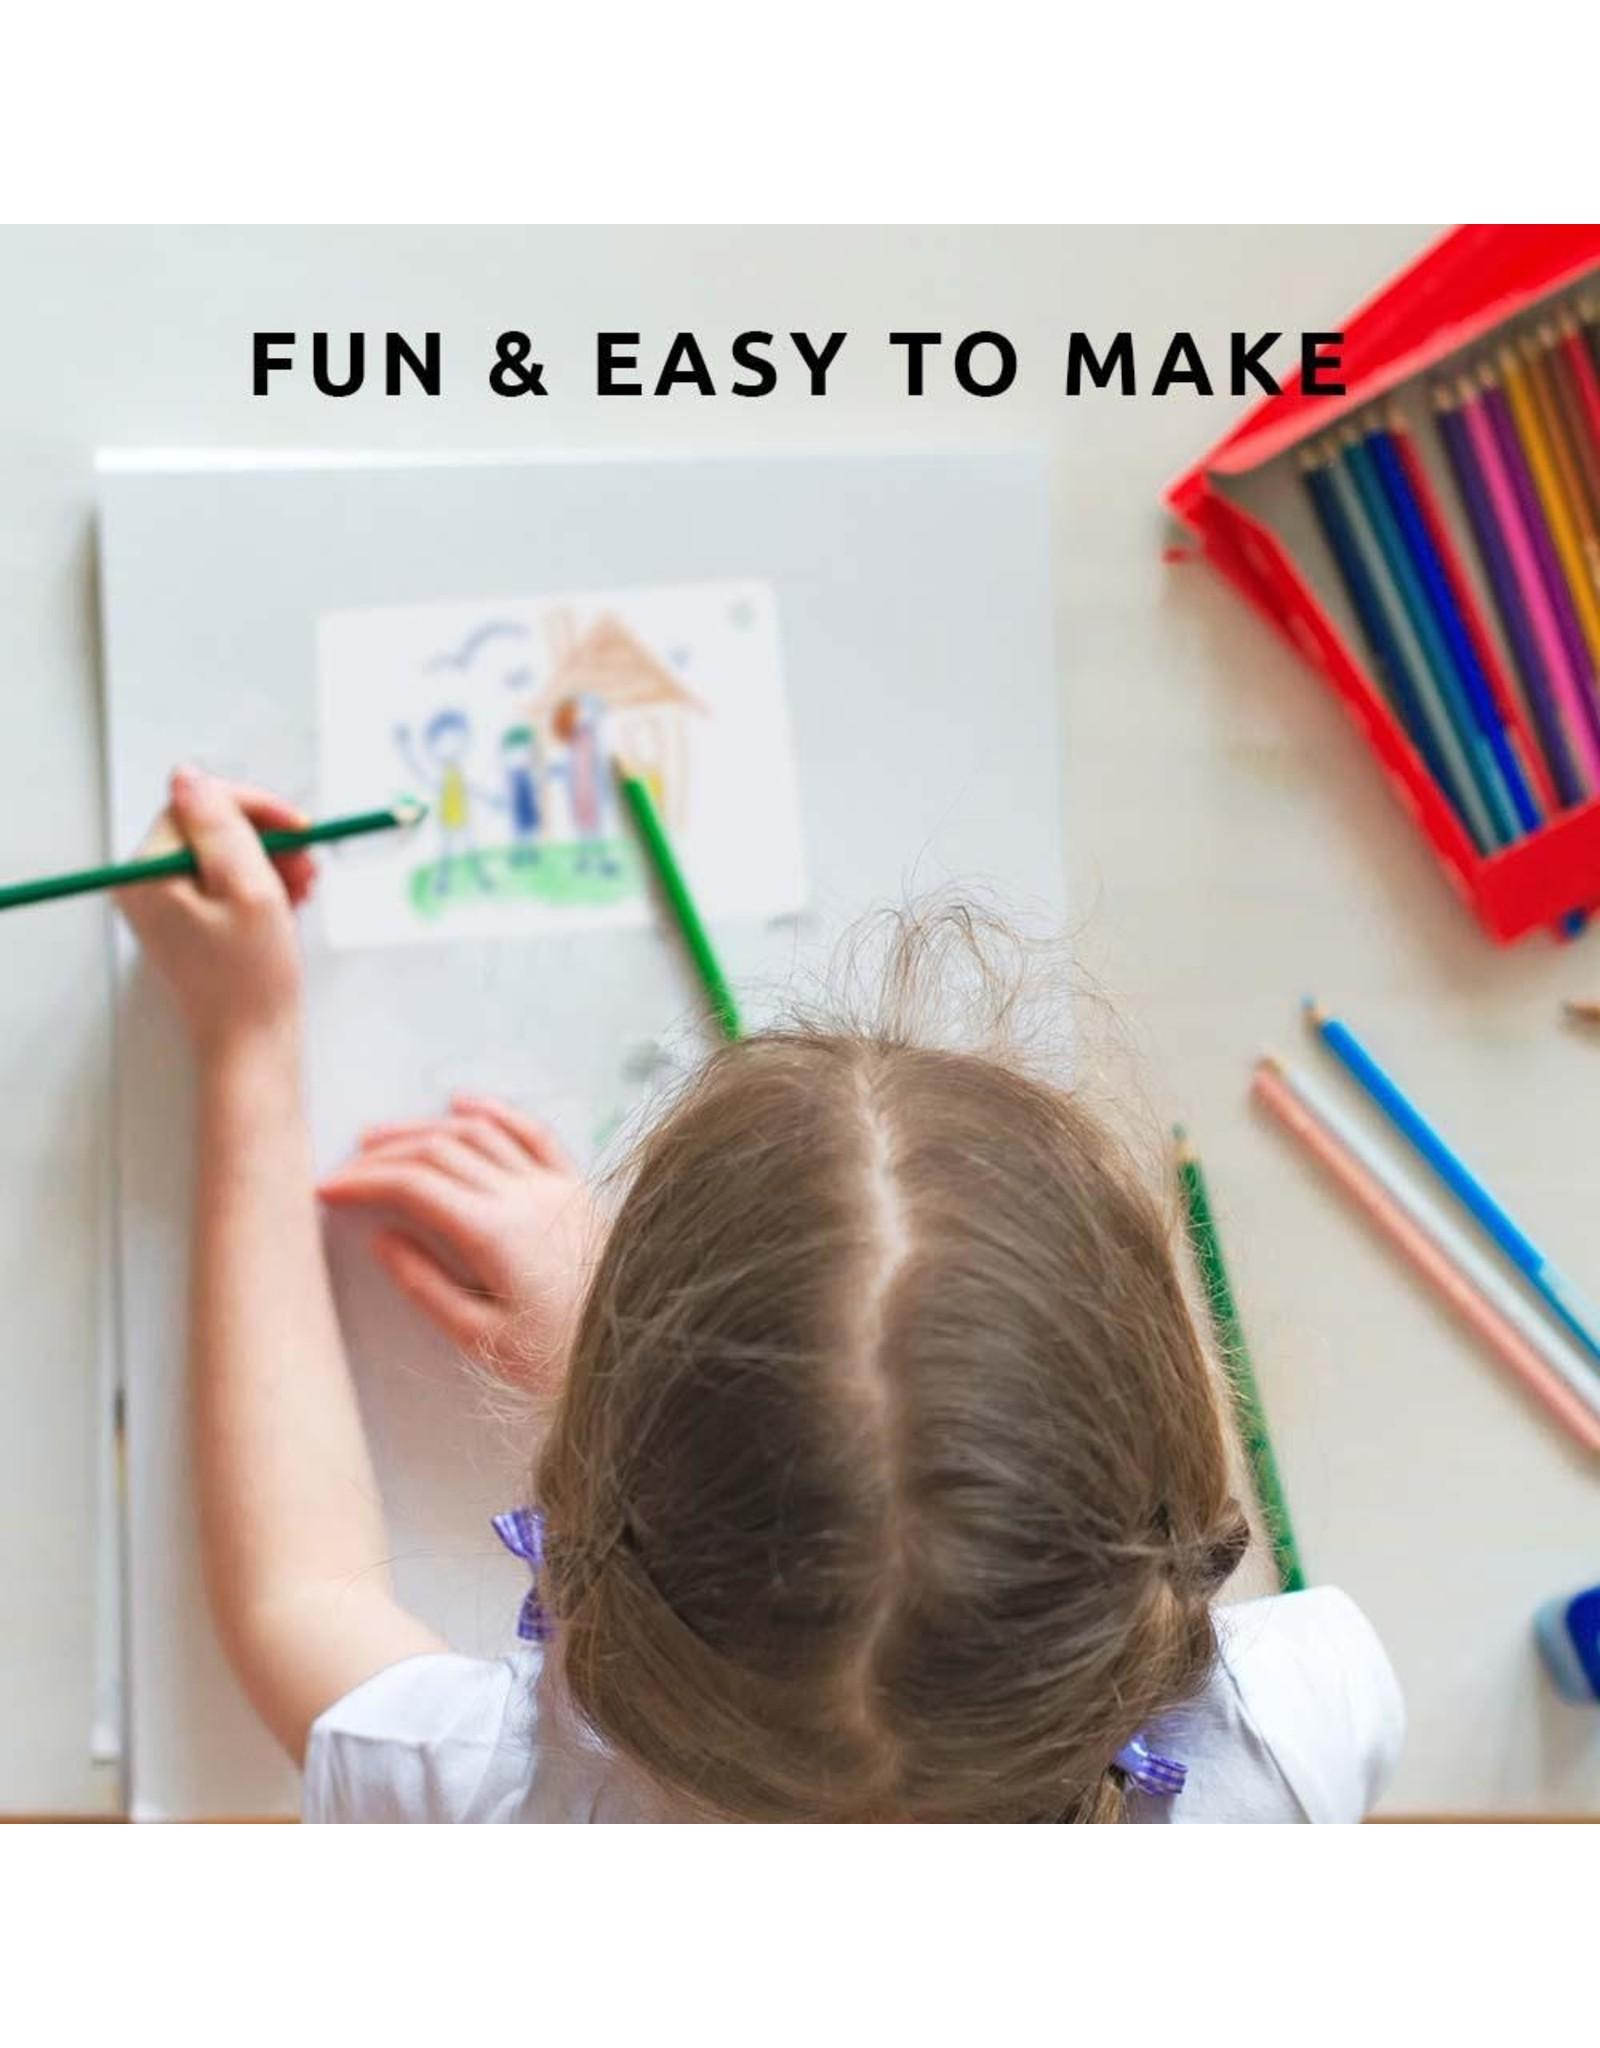 DIY keyring with self-made  kids drawing